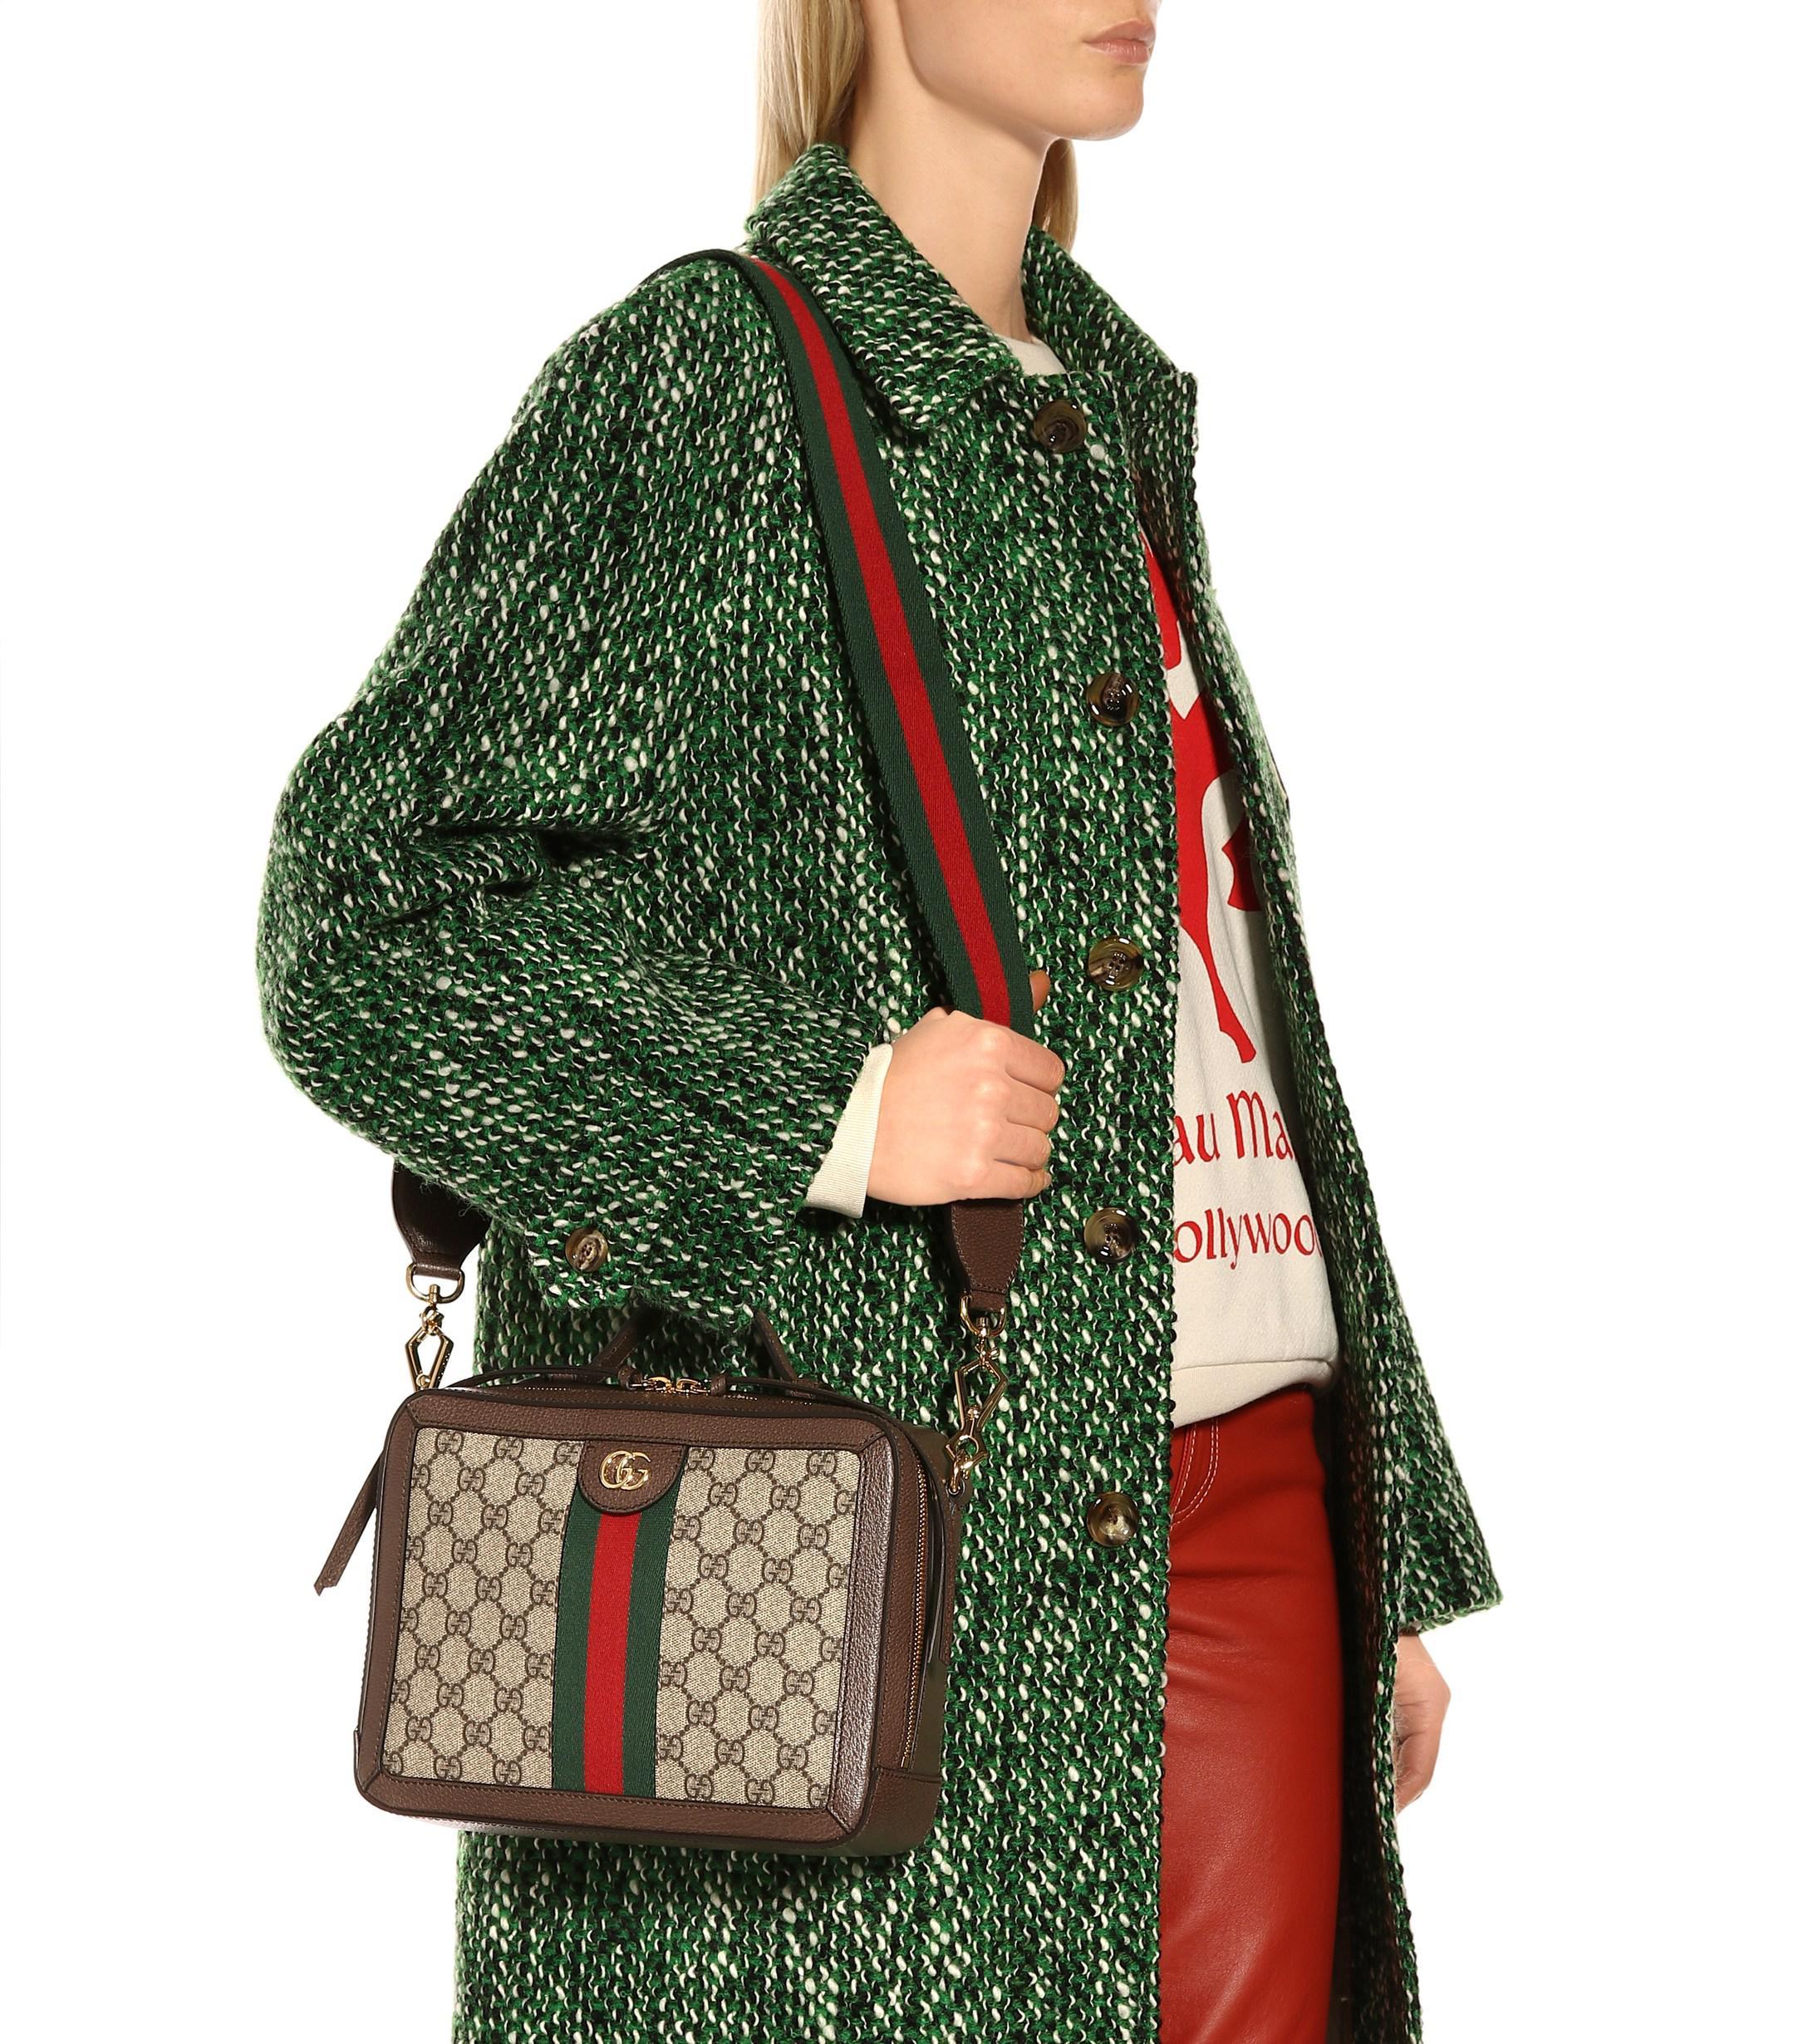 f6668b803 Gucci Ophidia Small GG Supreme Shoulder Bag - Lyst